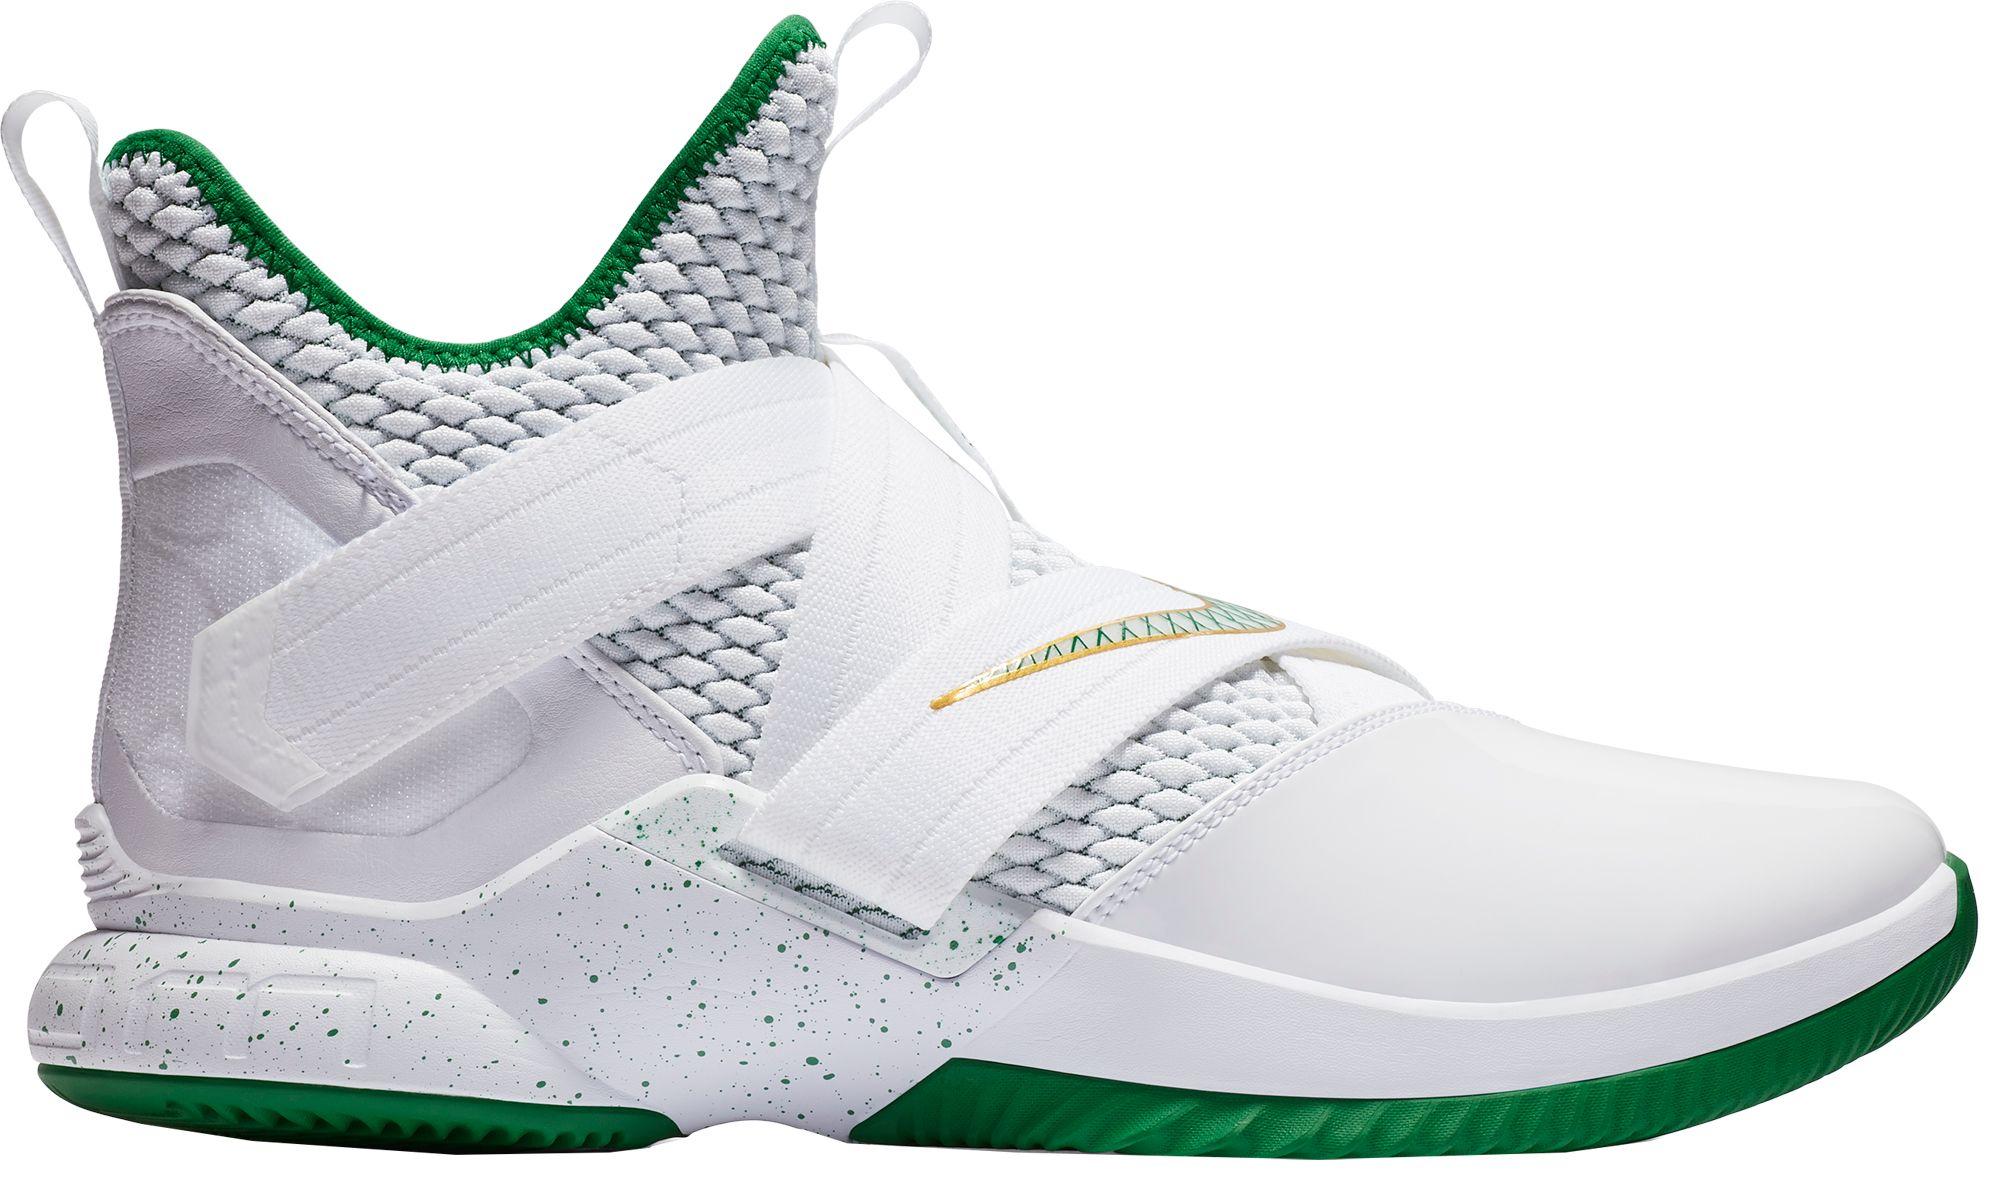 Jordans 7 2012 Cole Haan Nike Air Boots Ebay  1e8476d24c